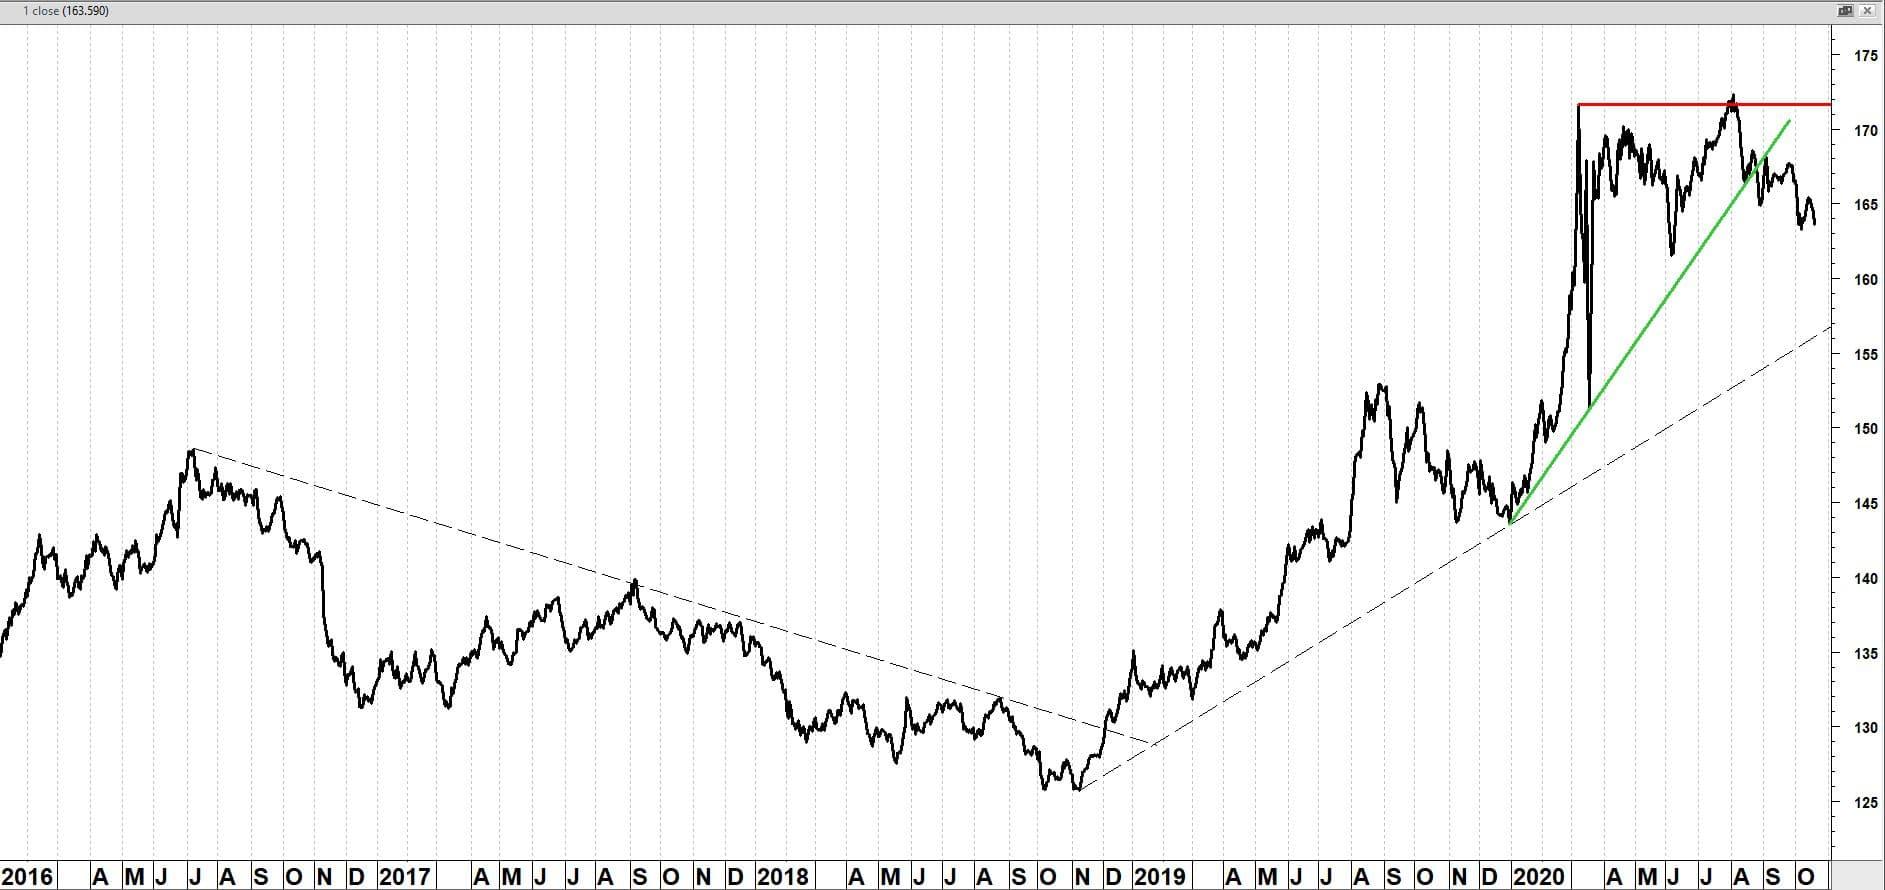 iShares 10-20 Year Treasury Bond ETF (TLH)